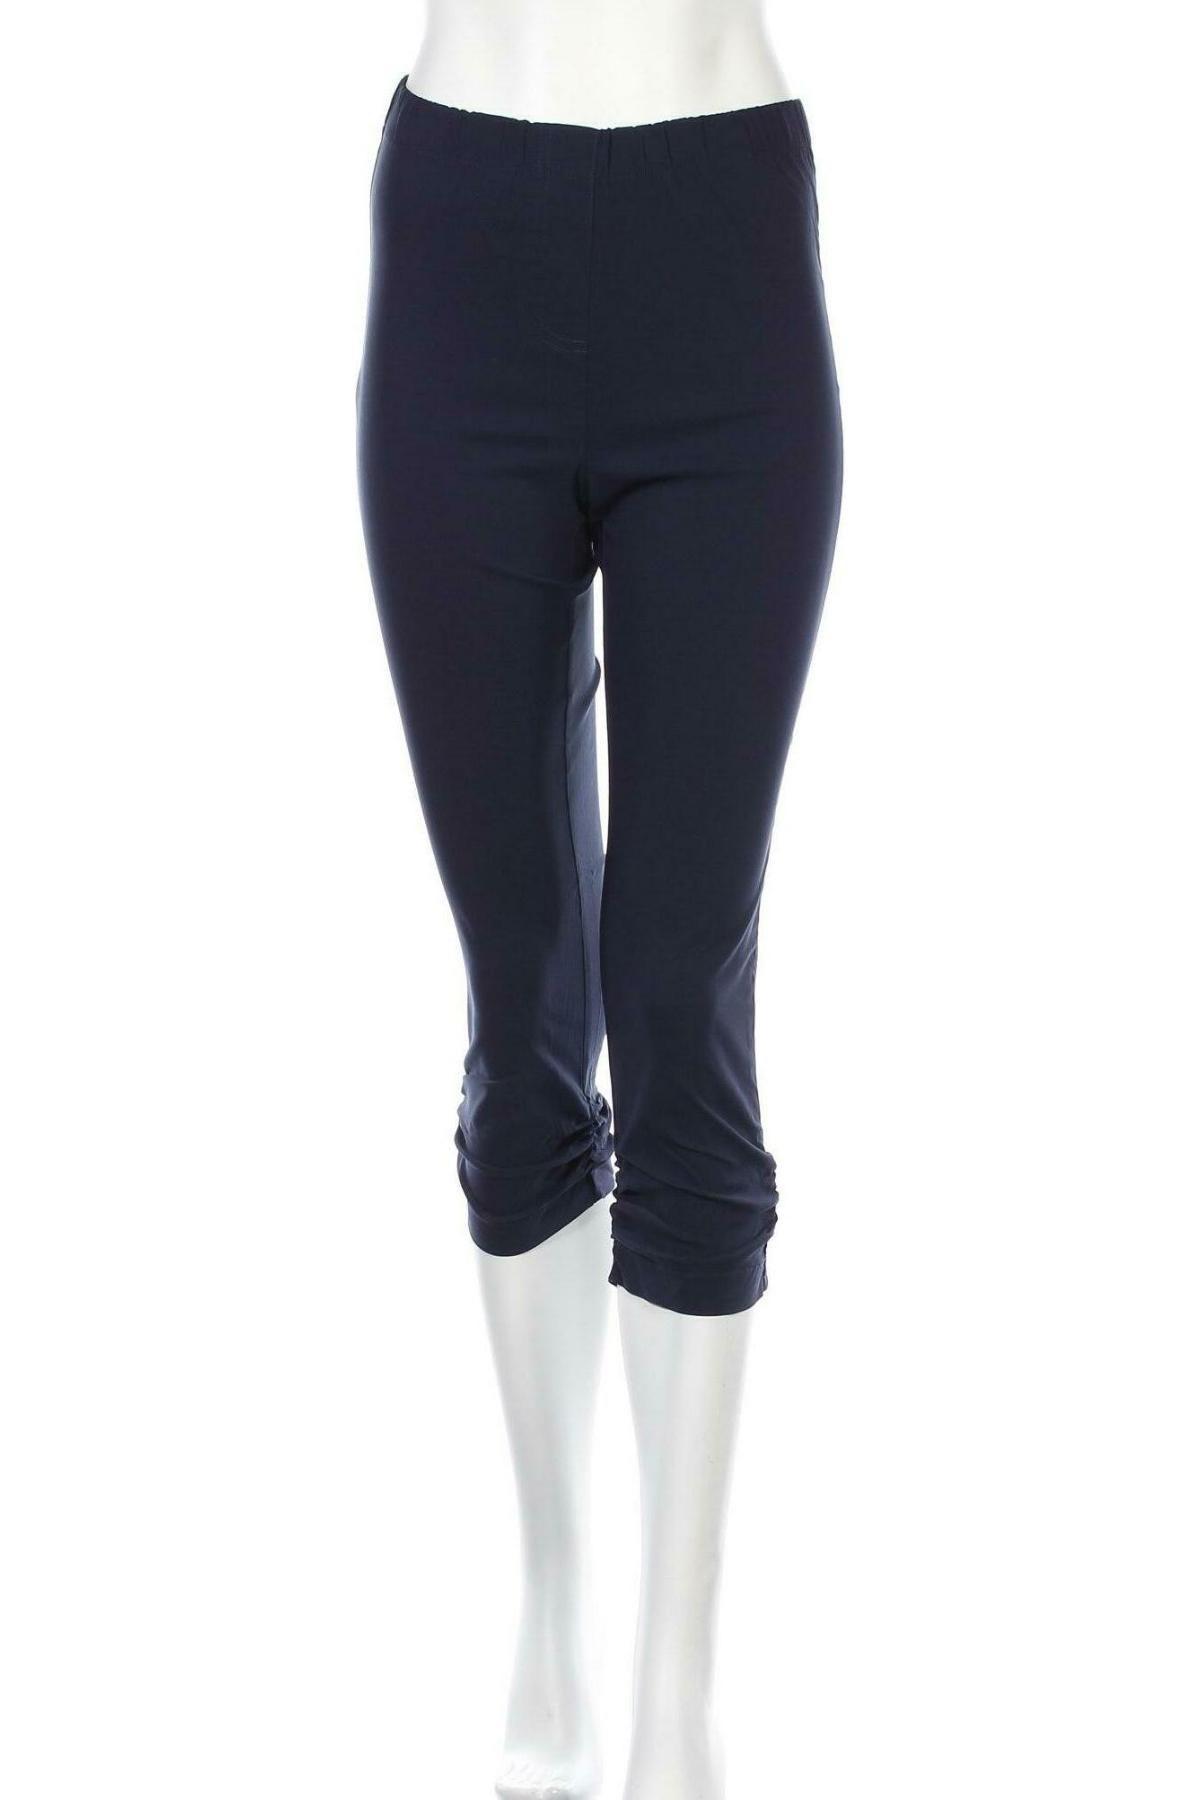 Дамски панталон Aniston, Размер S, Цвят Син, 70% памук, 26% полиестер, 4% еластан, Цена 13,09лв.